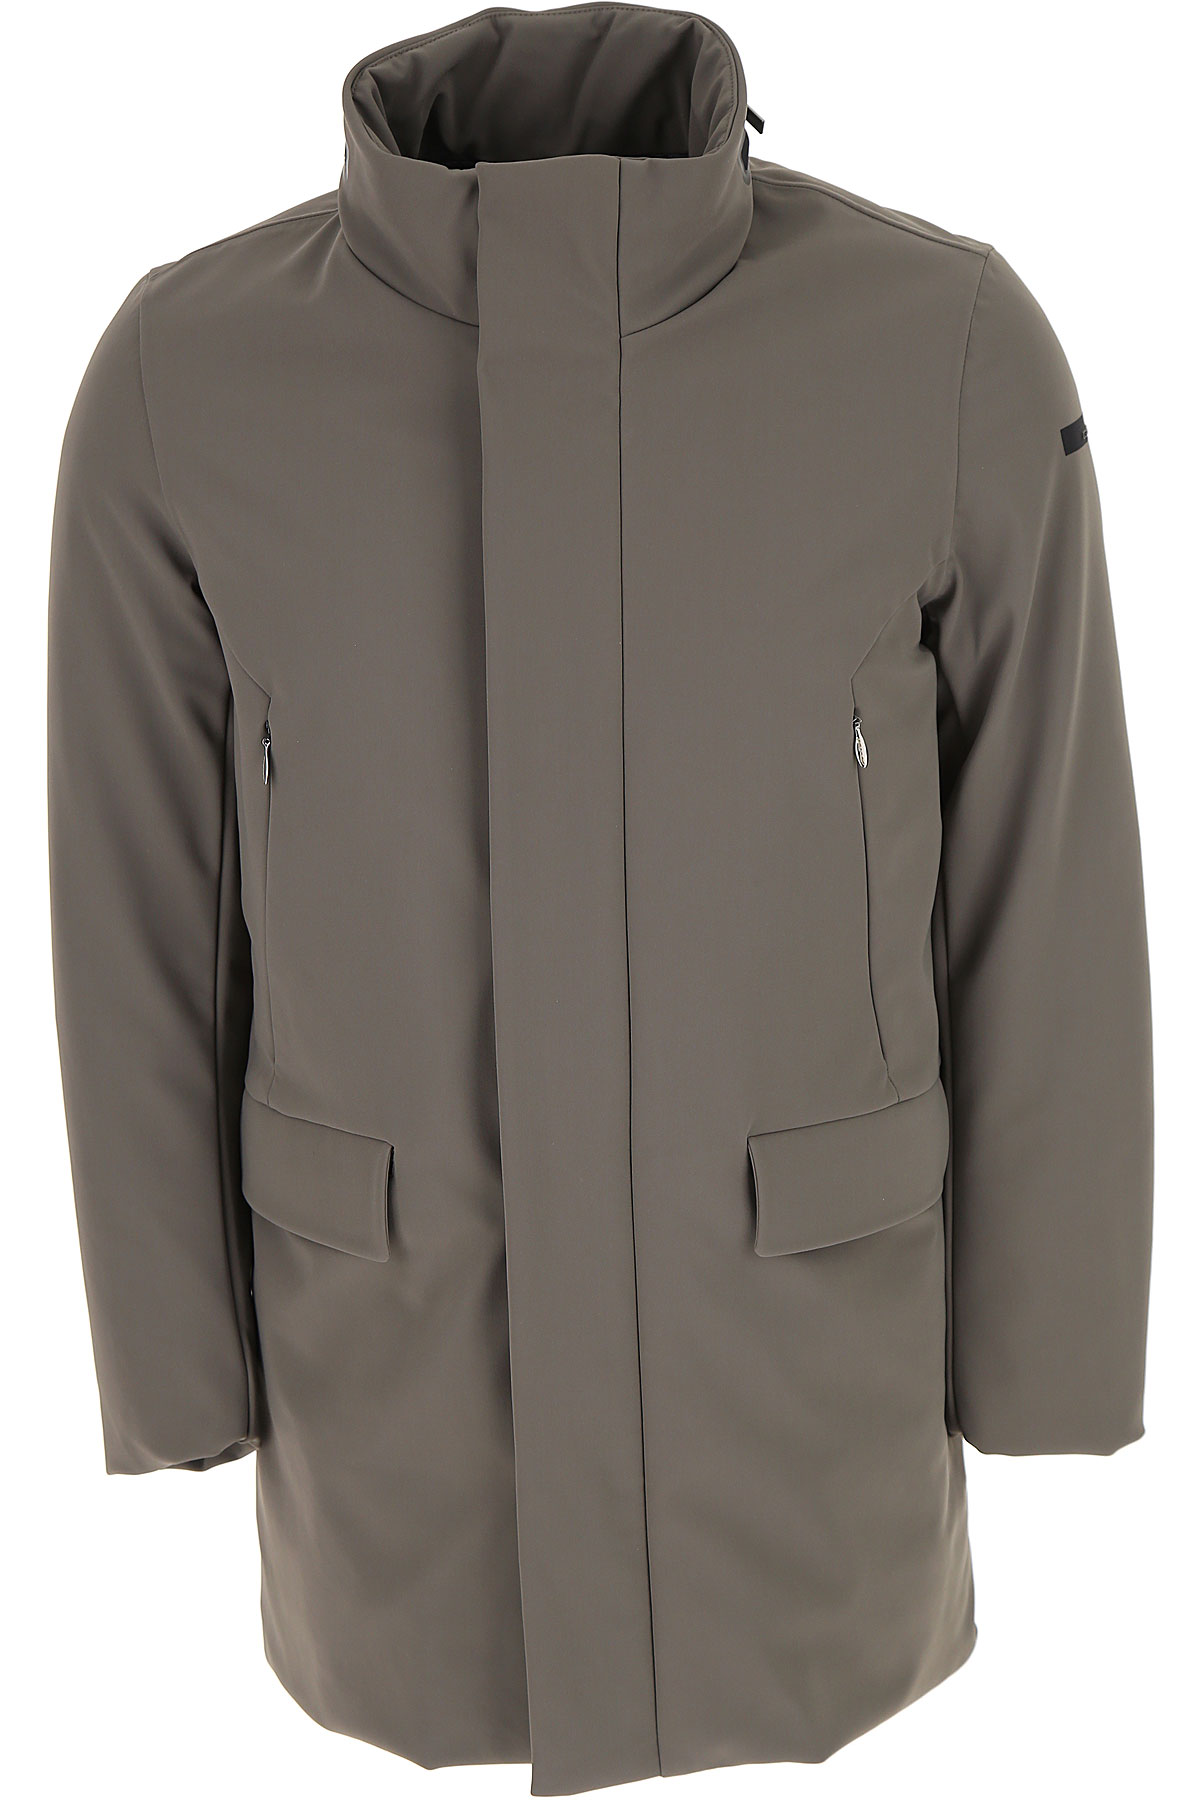 Image of RRD Down Jacket for Men, Puffer Ski Jacket, Grey, polyester, 2017, L M S XL XXL